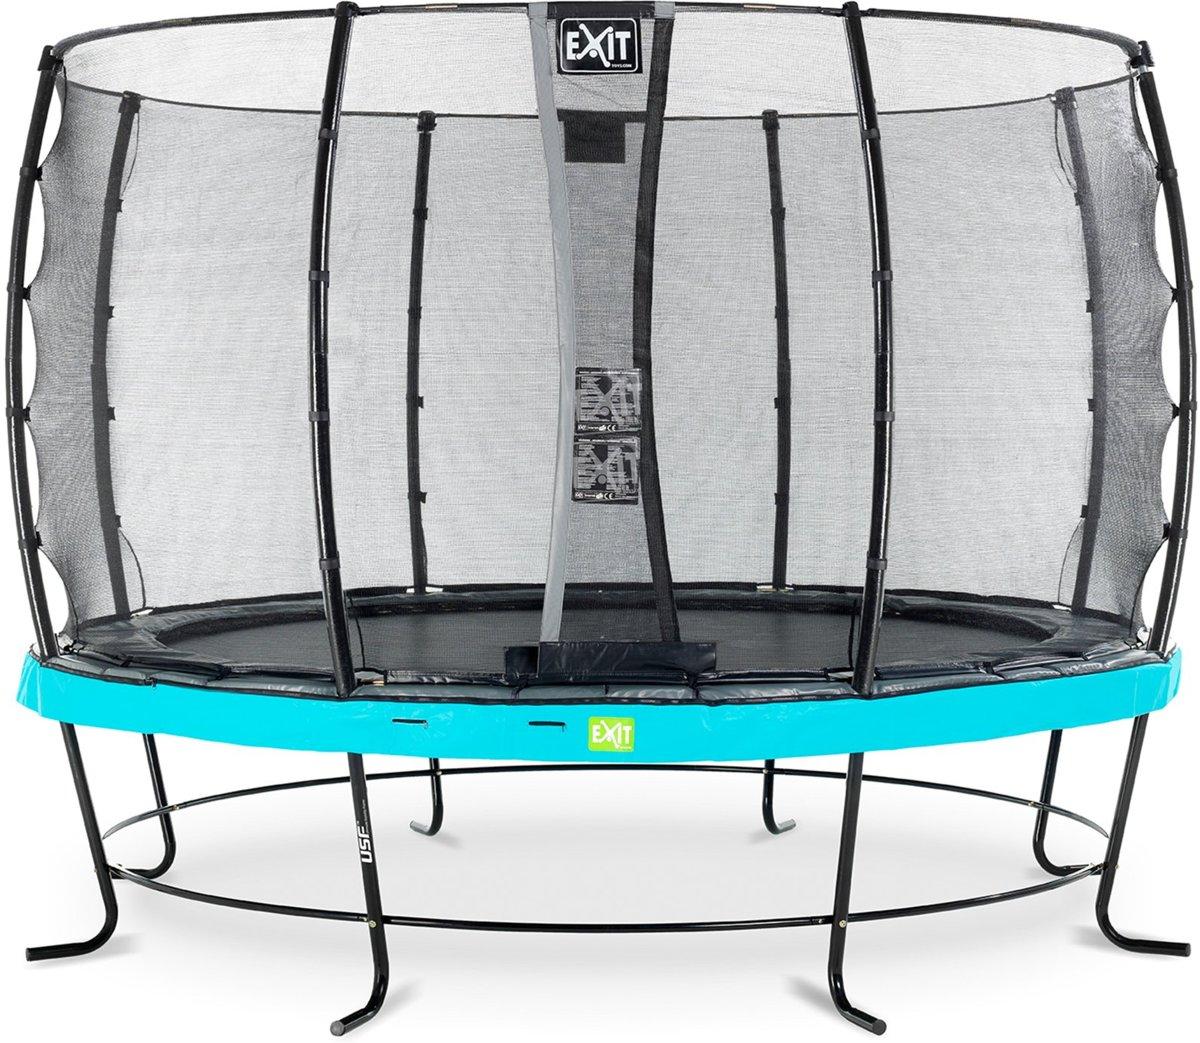 EXIT Elegant trampoline ø366cm met veiligheidsnet Economy - blauw